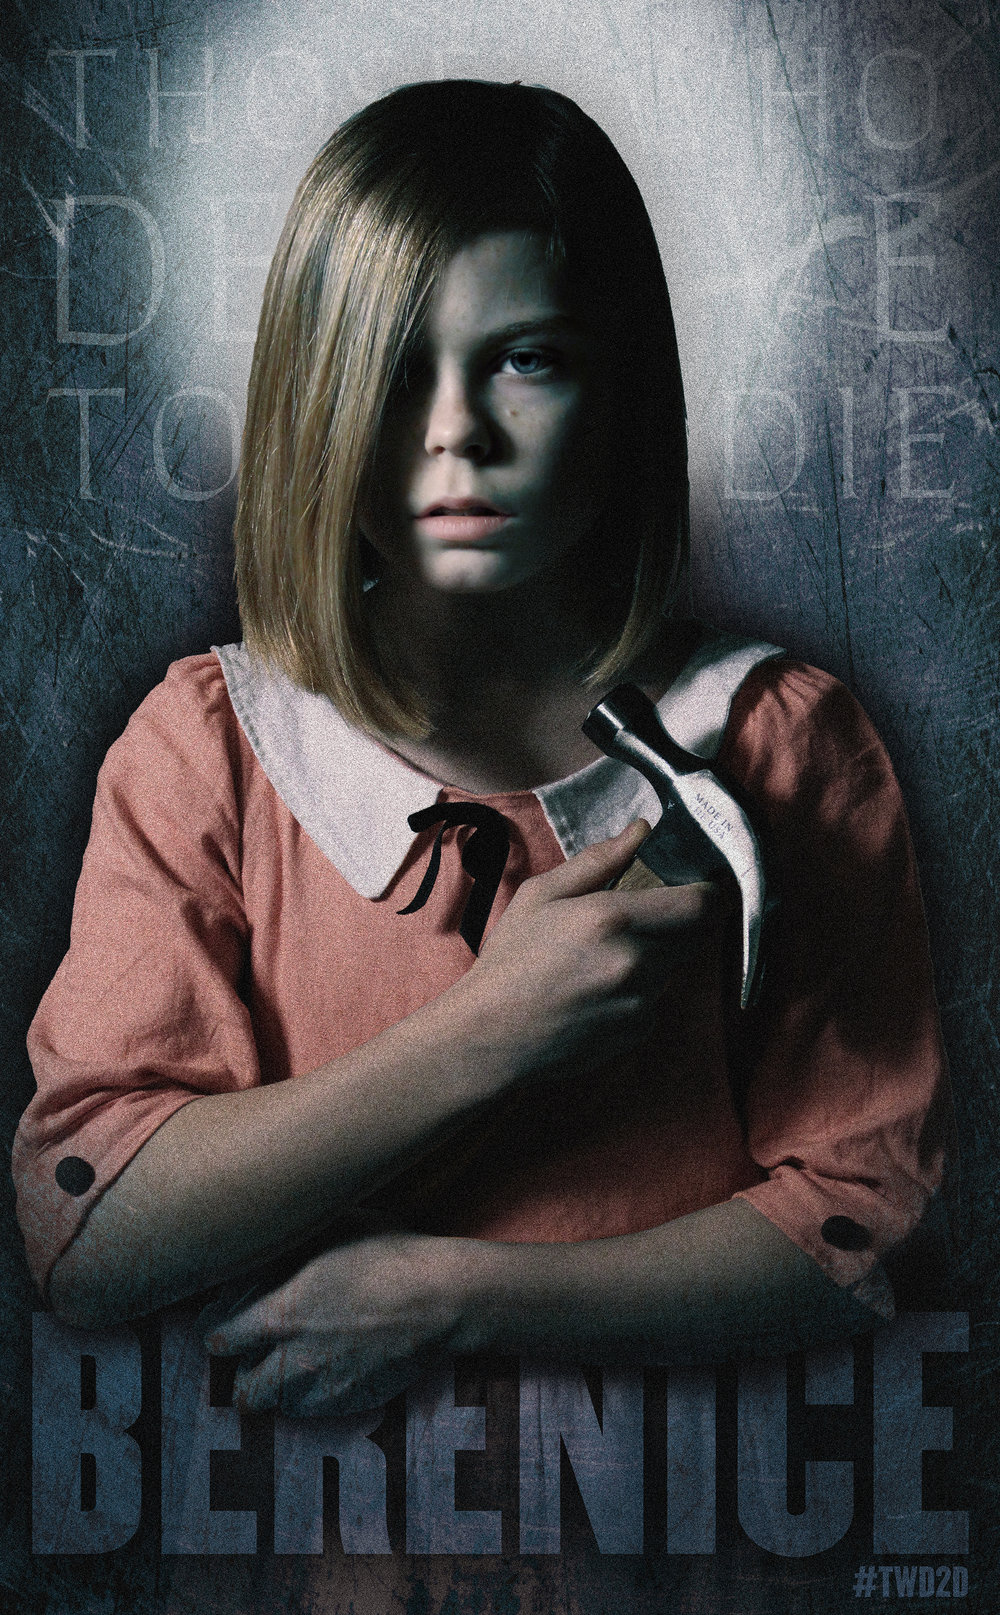 Berenice-Poster.jpg